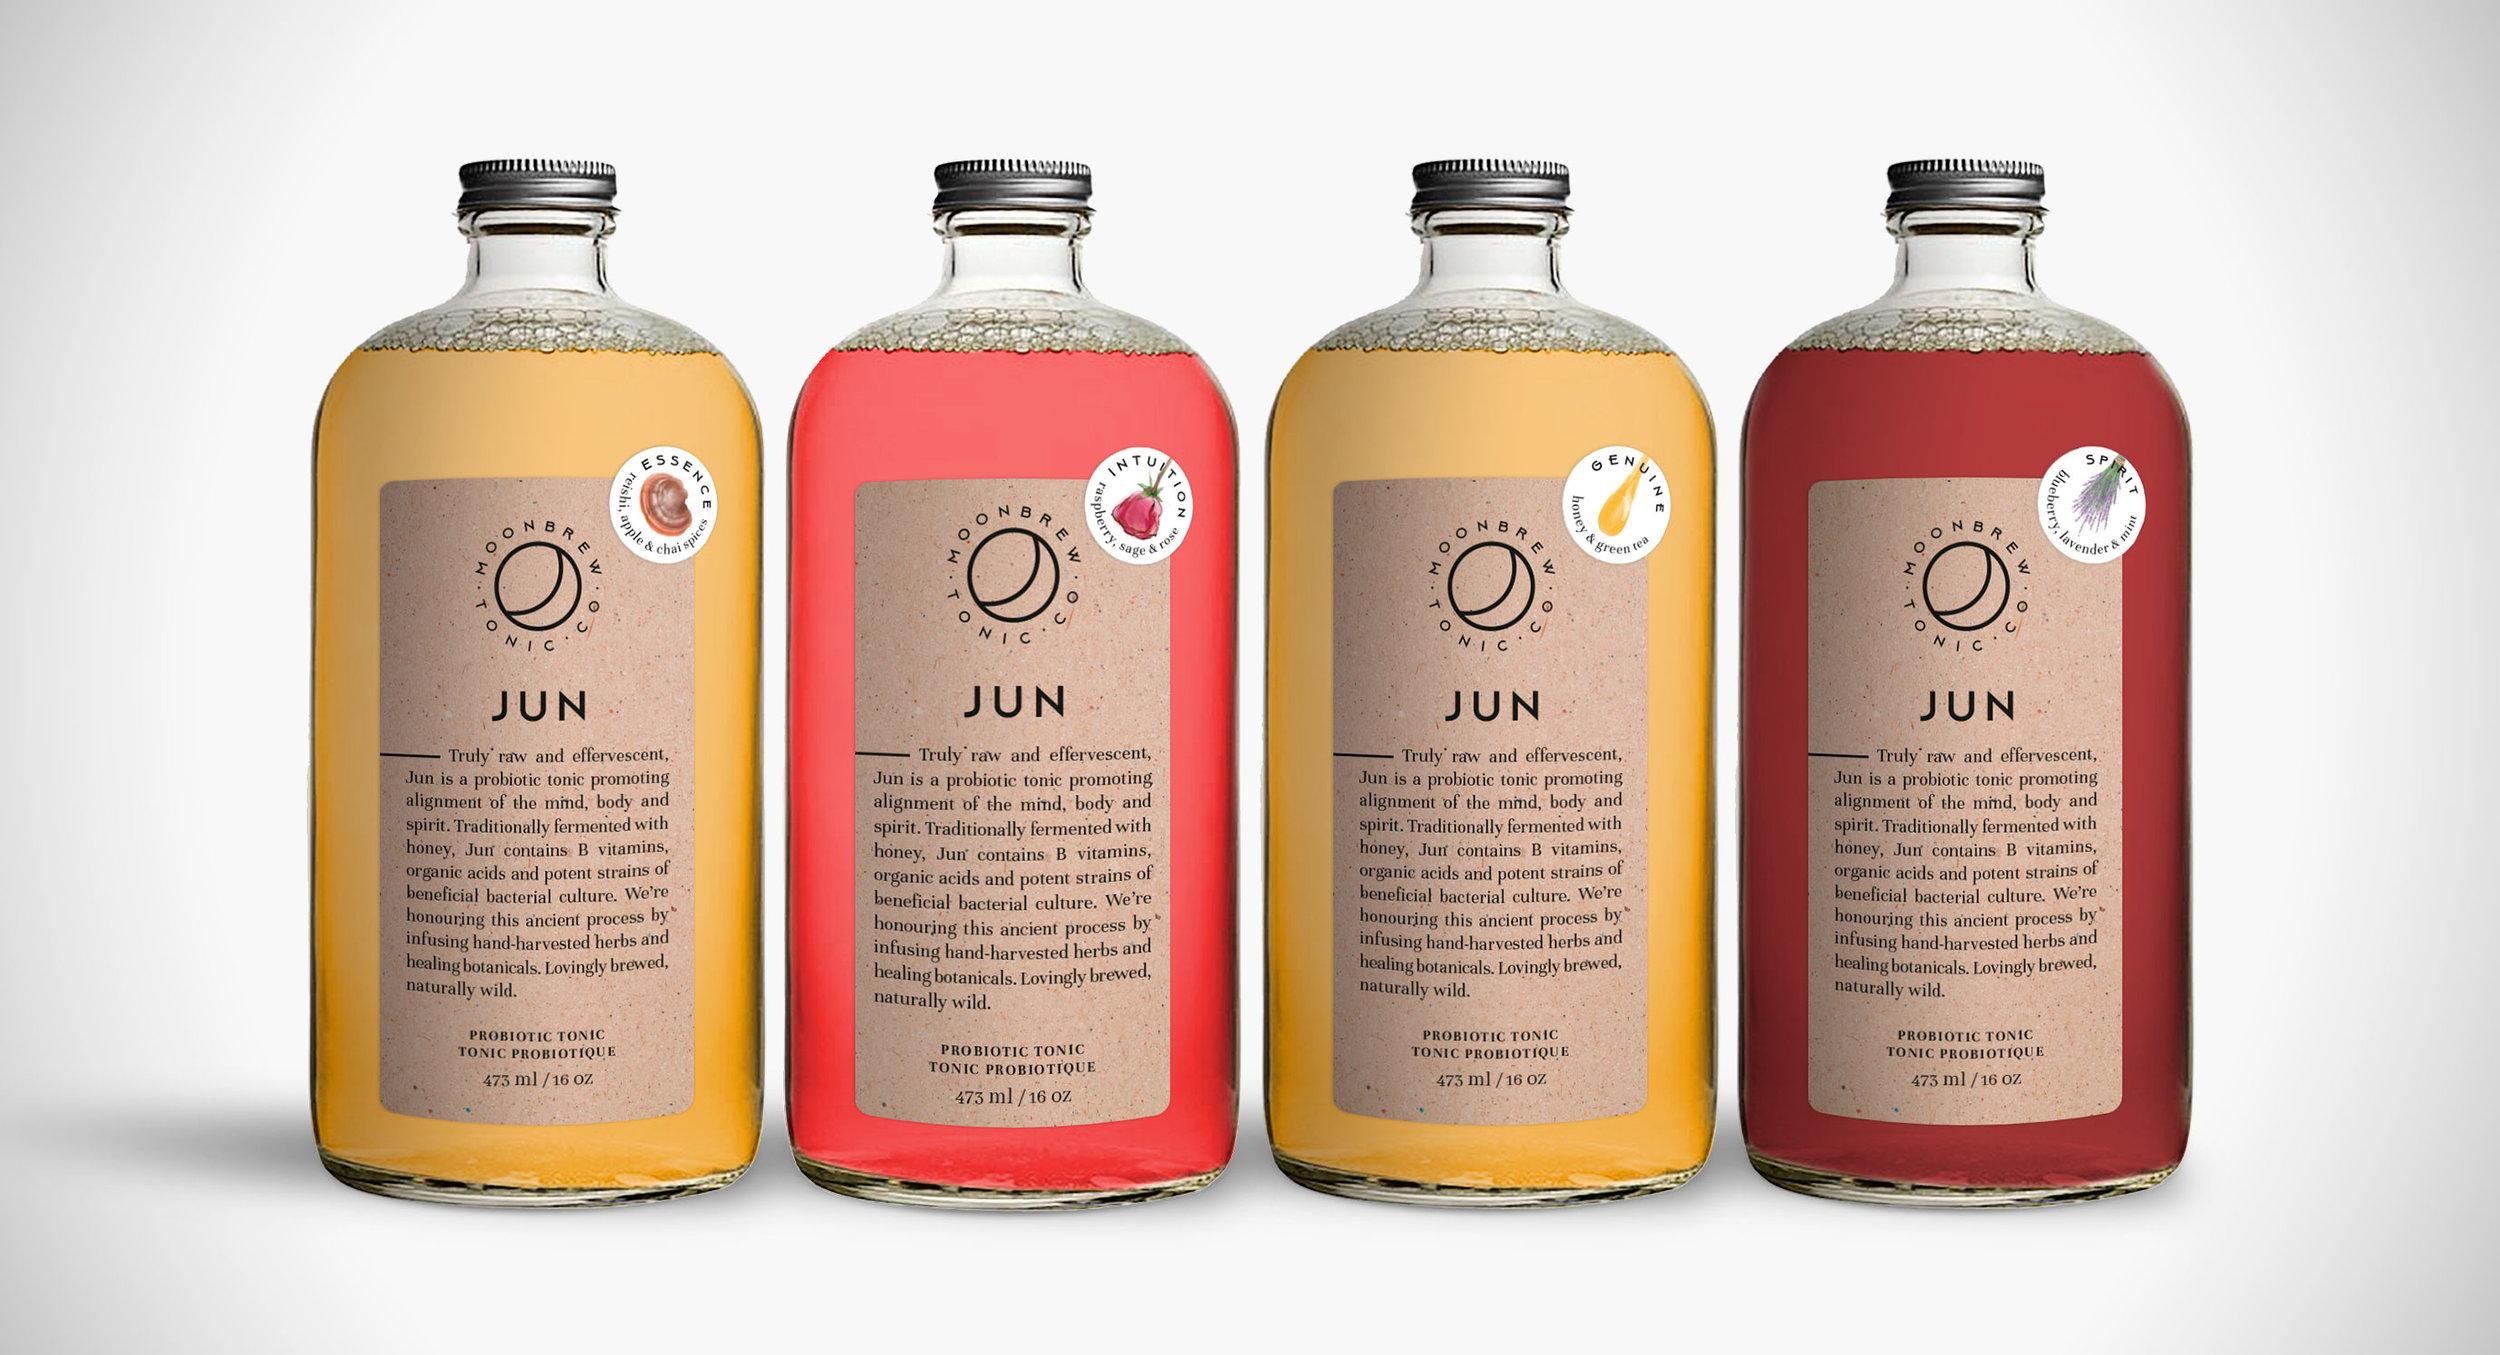 Dana Lu graphic design moonbrew tonic bottle label design